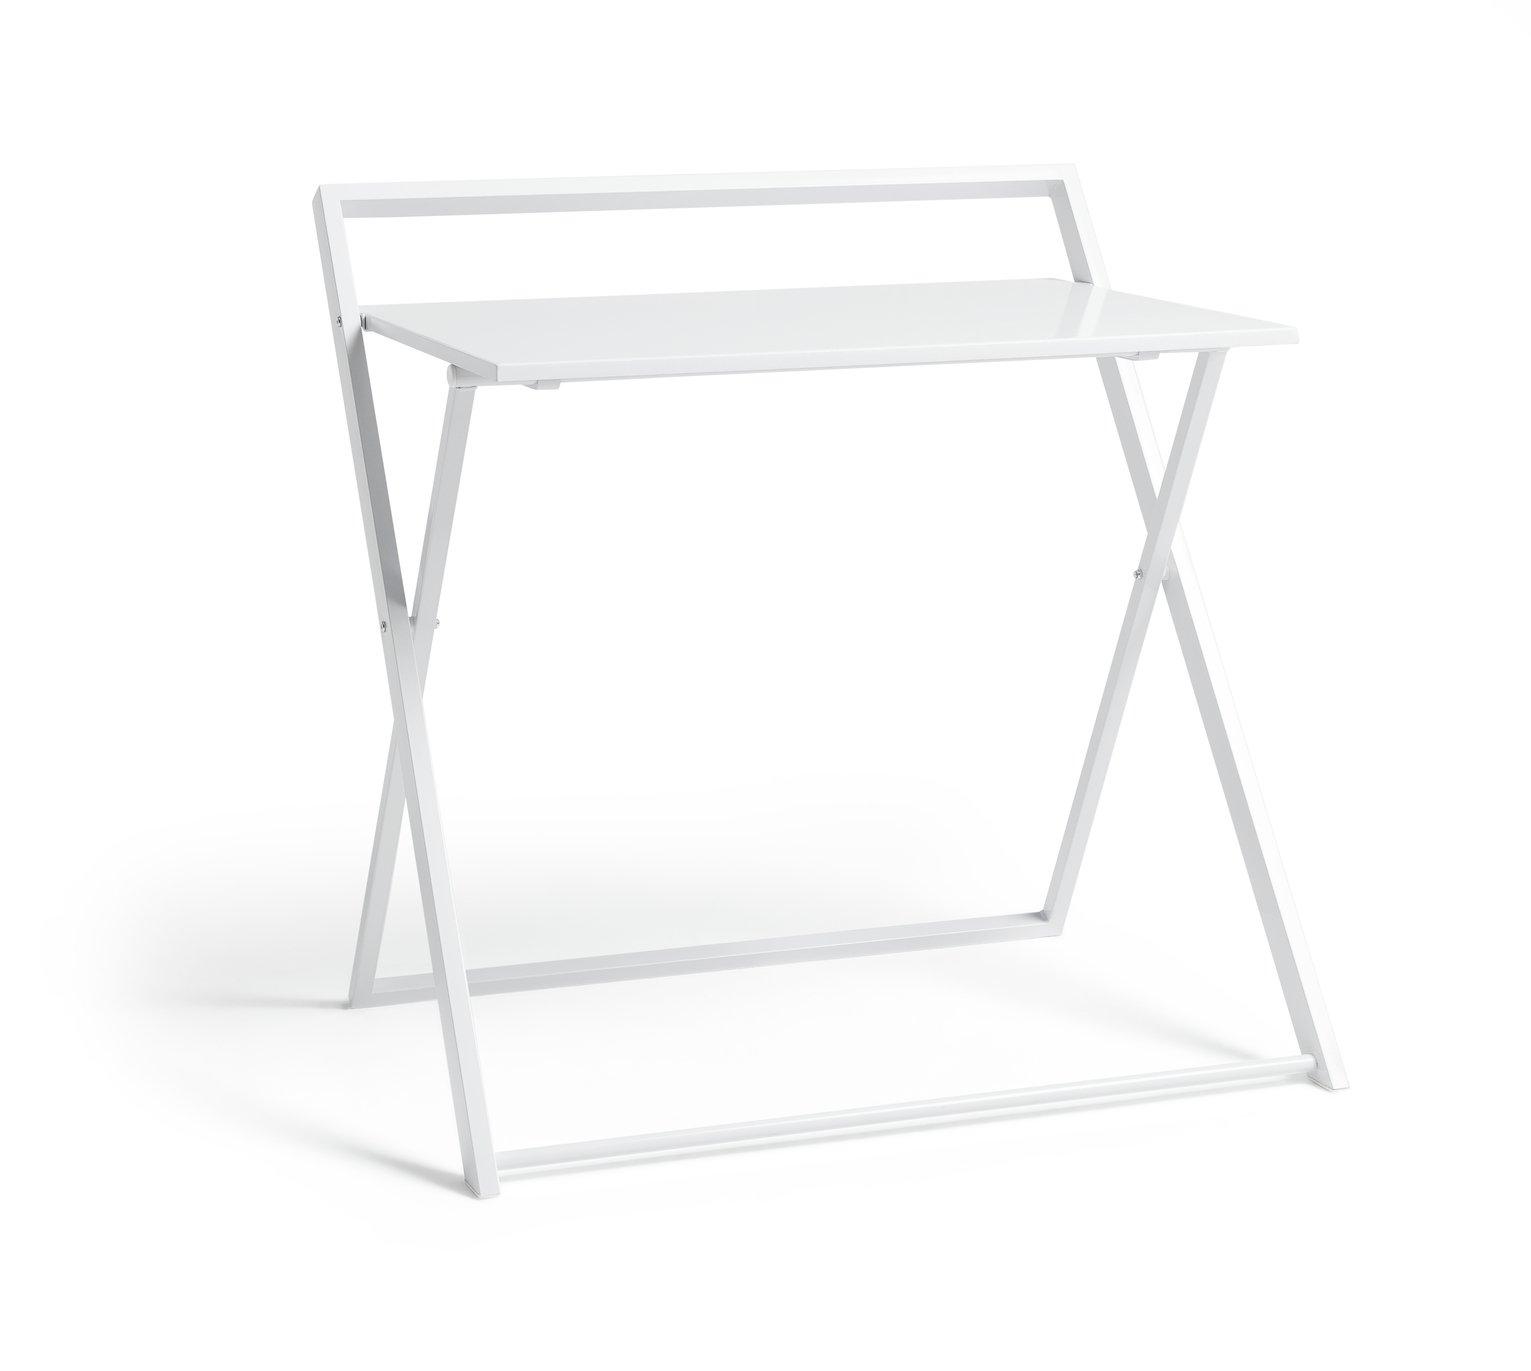 Small folding desk Kid Folding Desk Argos Results For Folding Desk